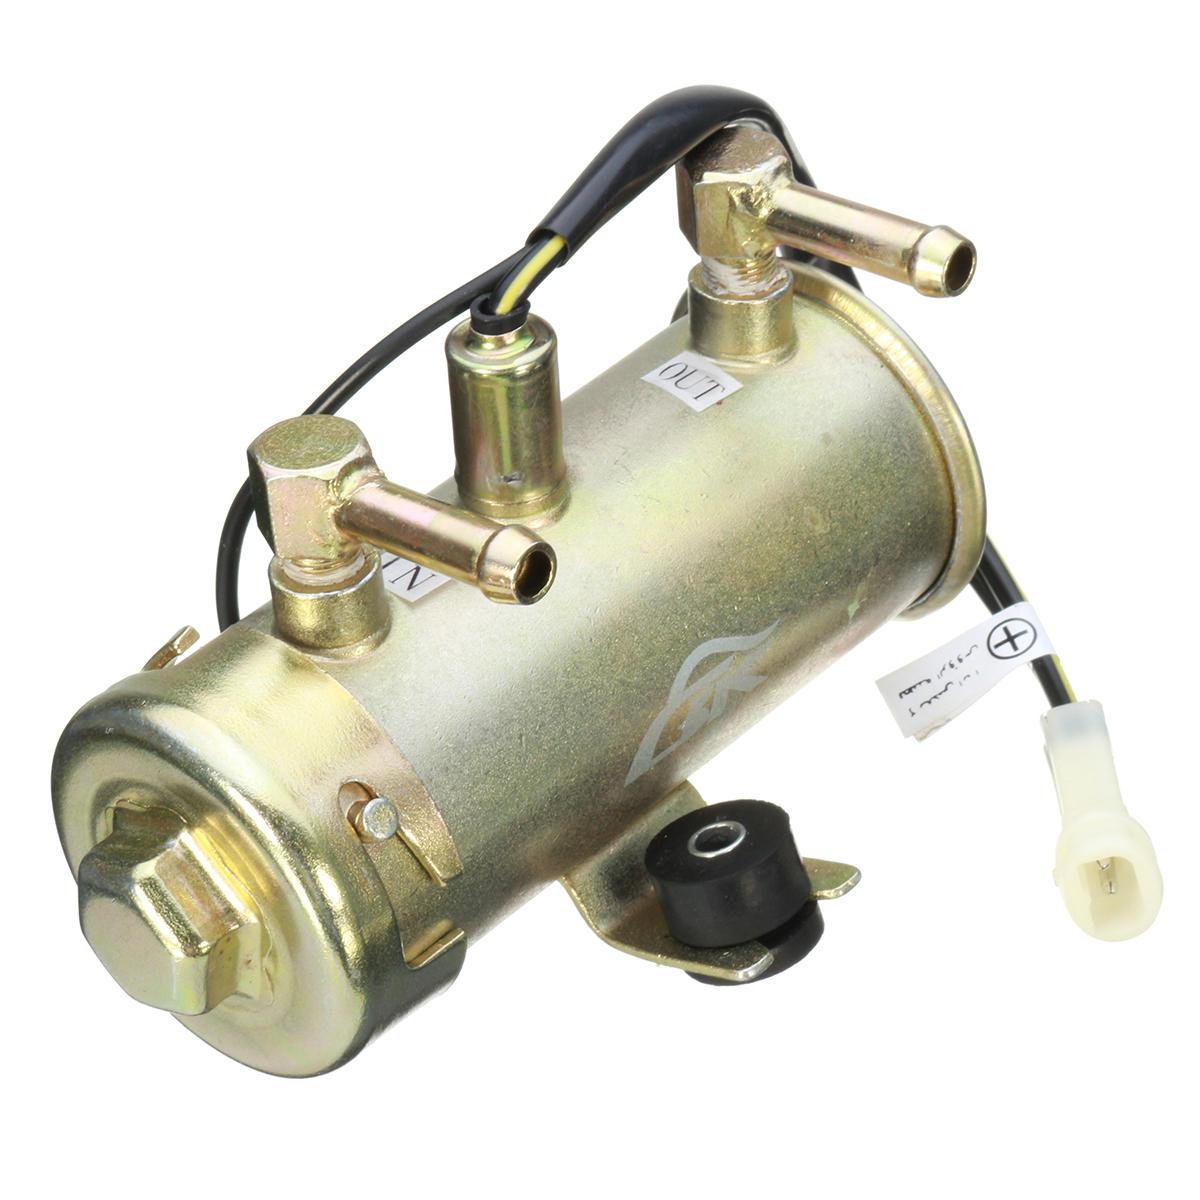 hight resolution of universal 12v electric fuel pump petrol diesel pumps kit hrf 027 for petrol diesel bio